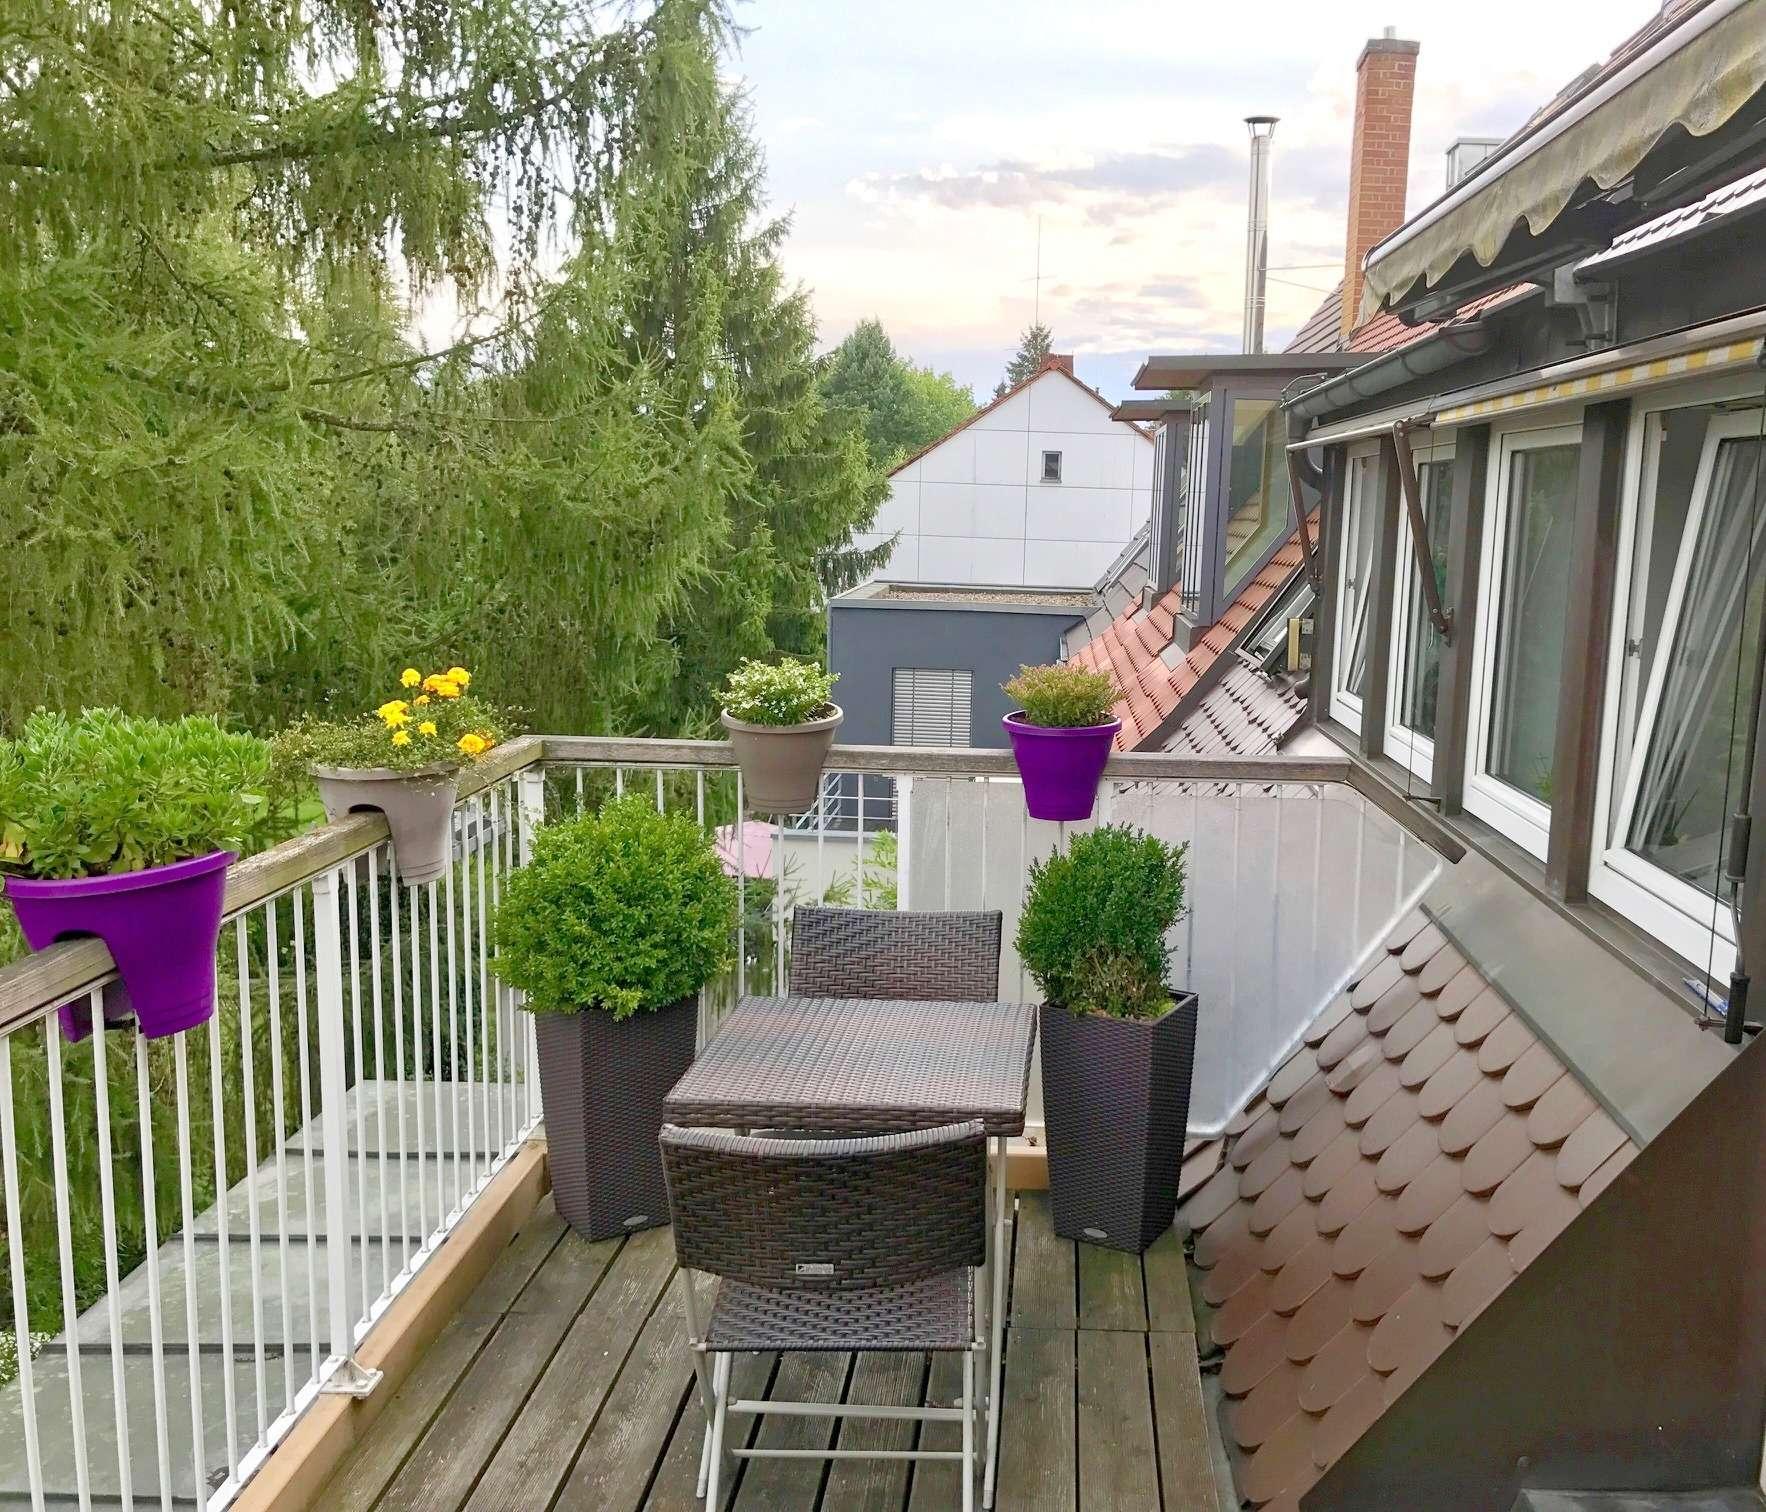 3-Zimmer Wohnung mit Balkon in Nürnberg Erlenstegen in St. Jobst (Nürnberg)